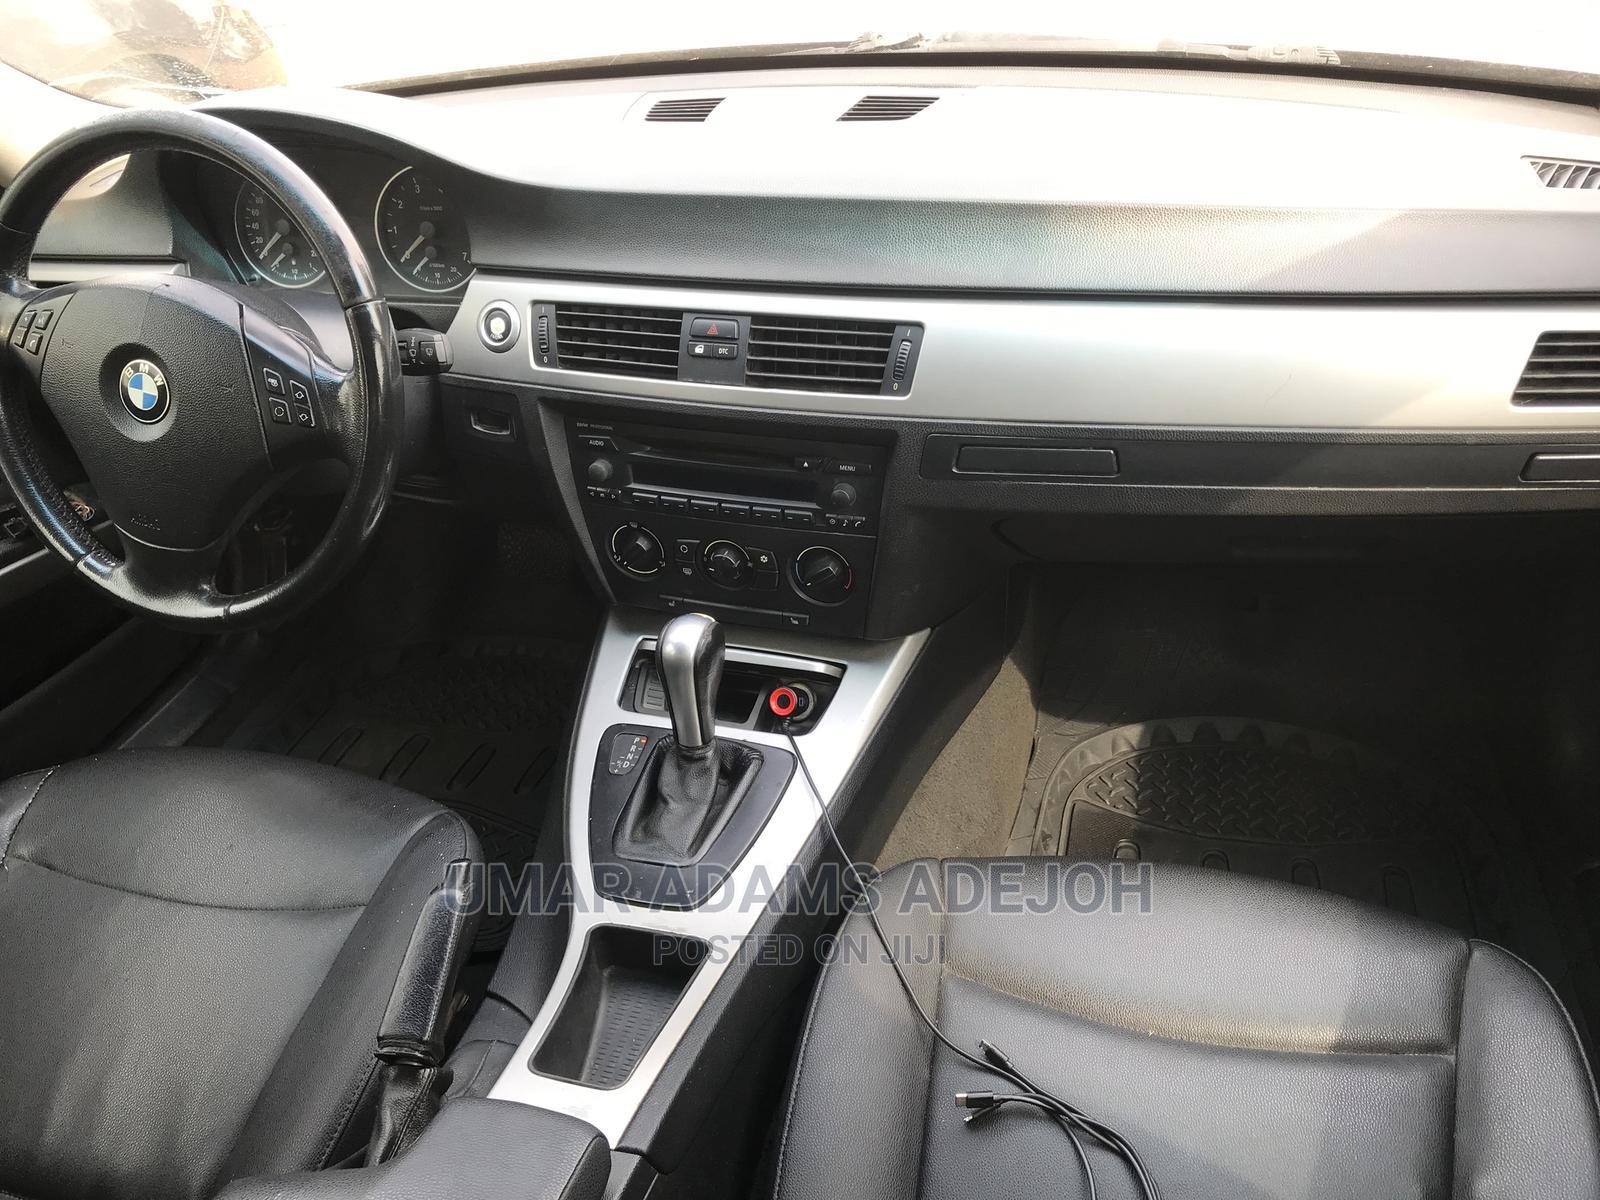 Archive: BMW 328i 2006 Silver